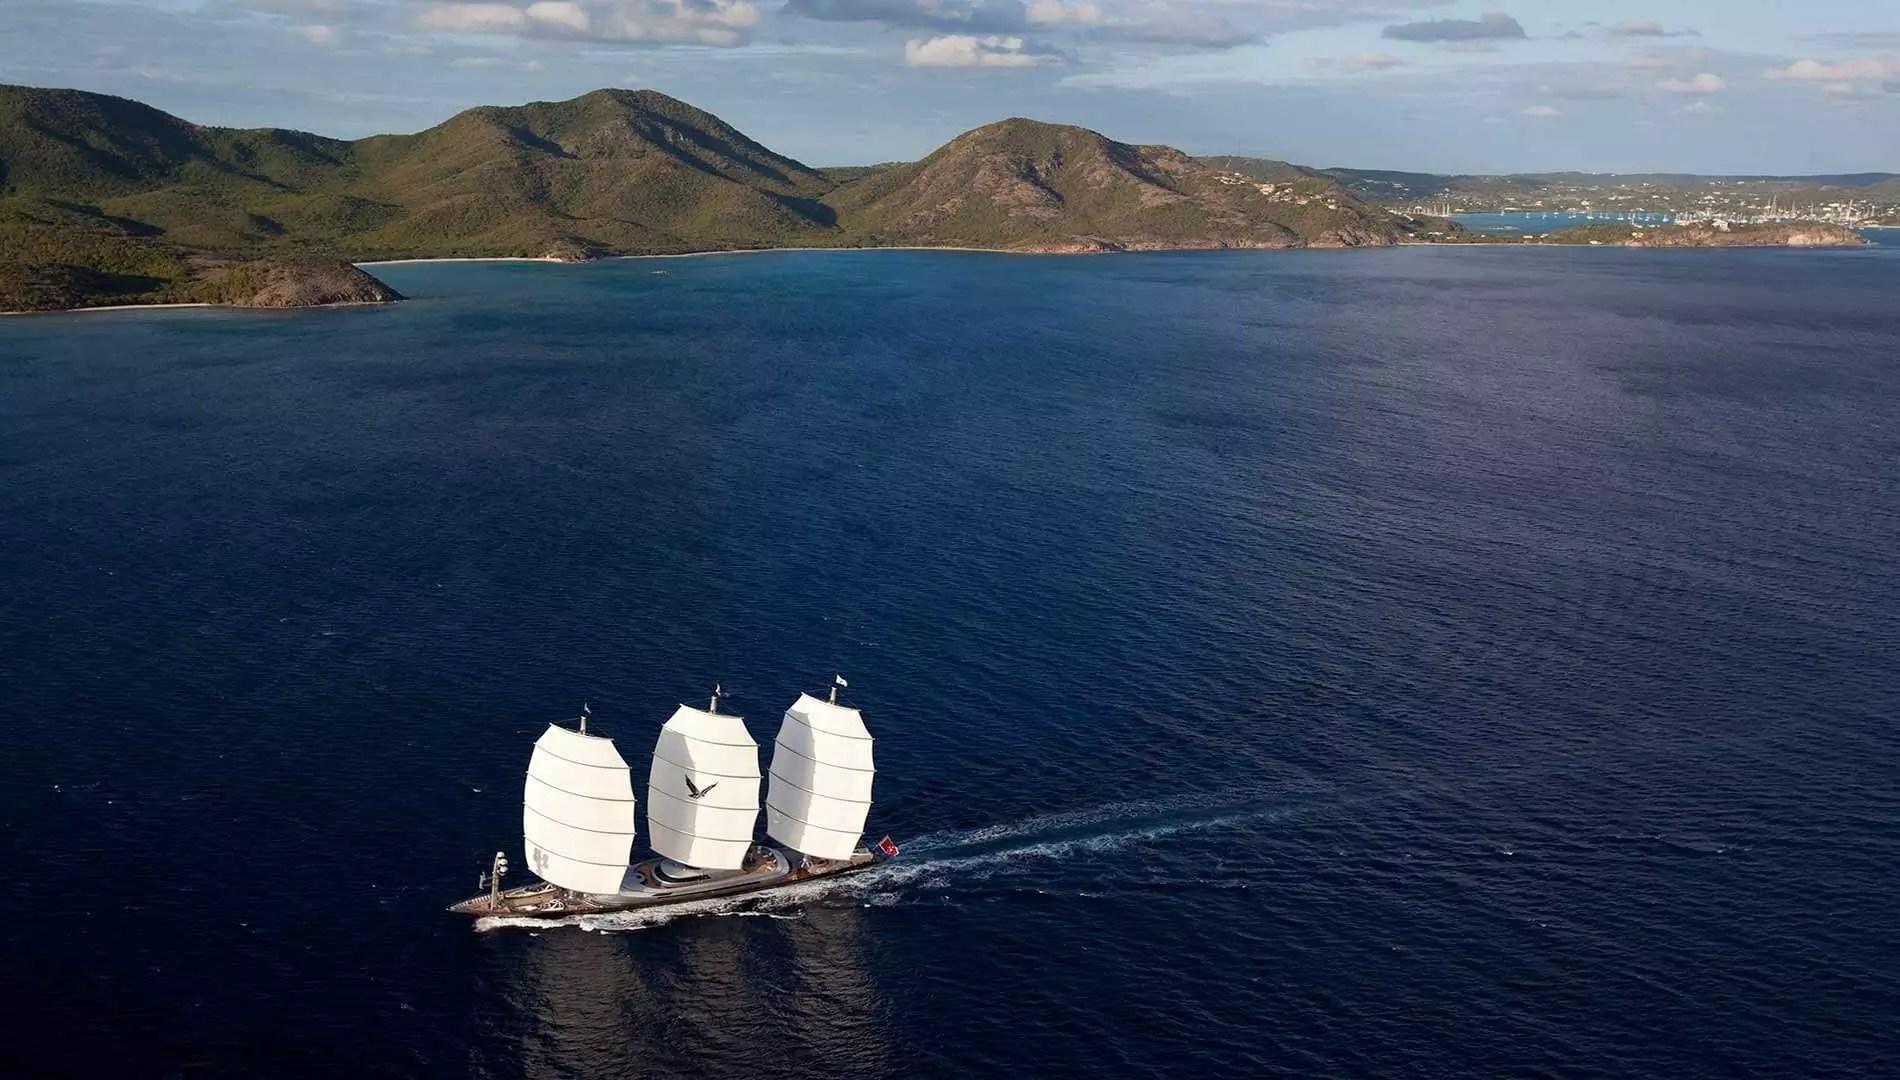 MALTESE FALCON Yacht Charter Perini Navi